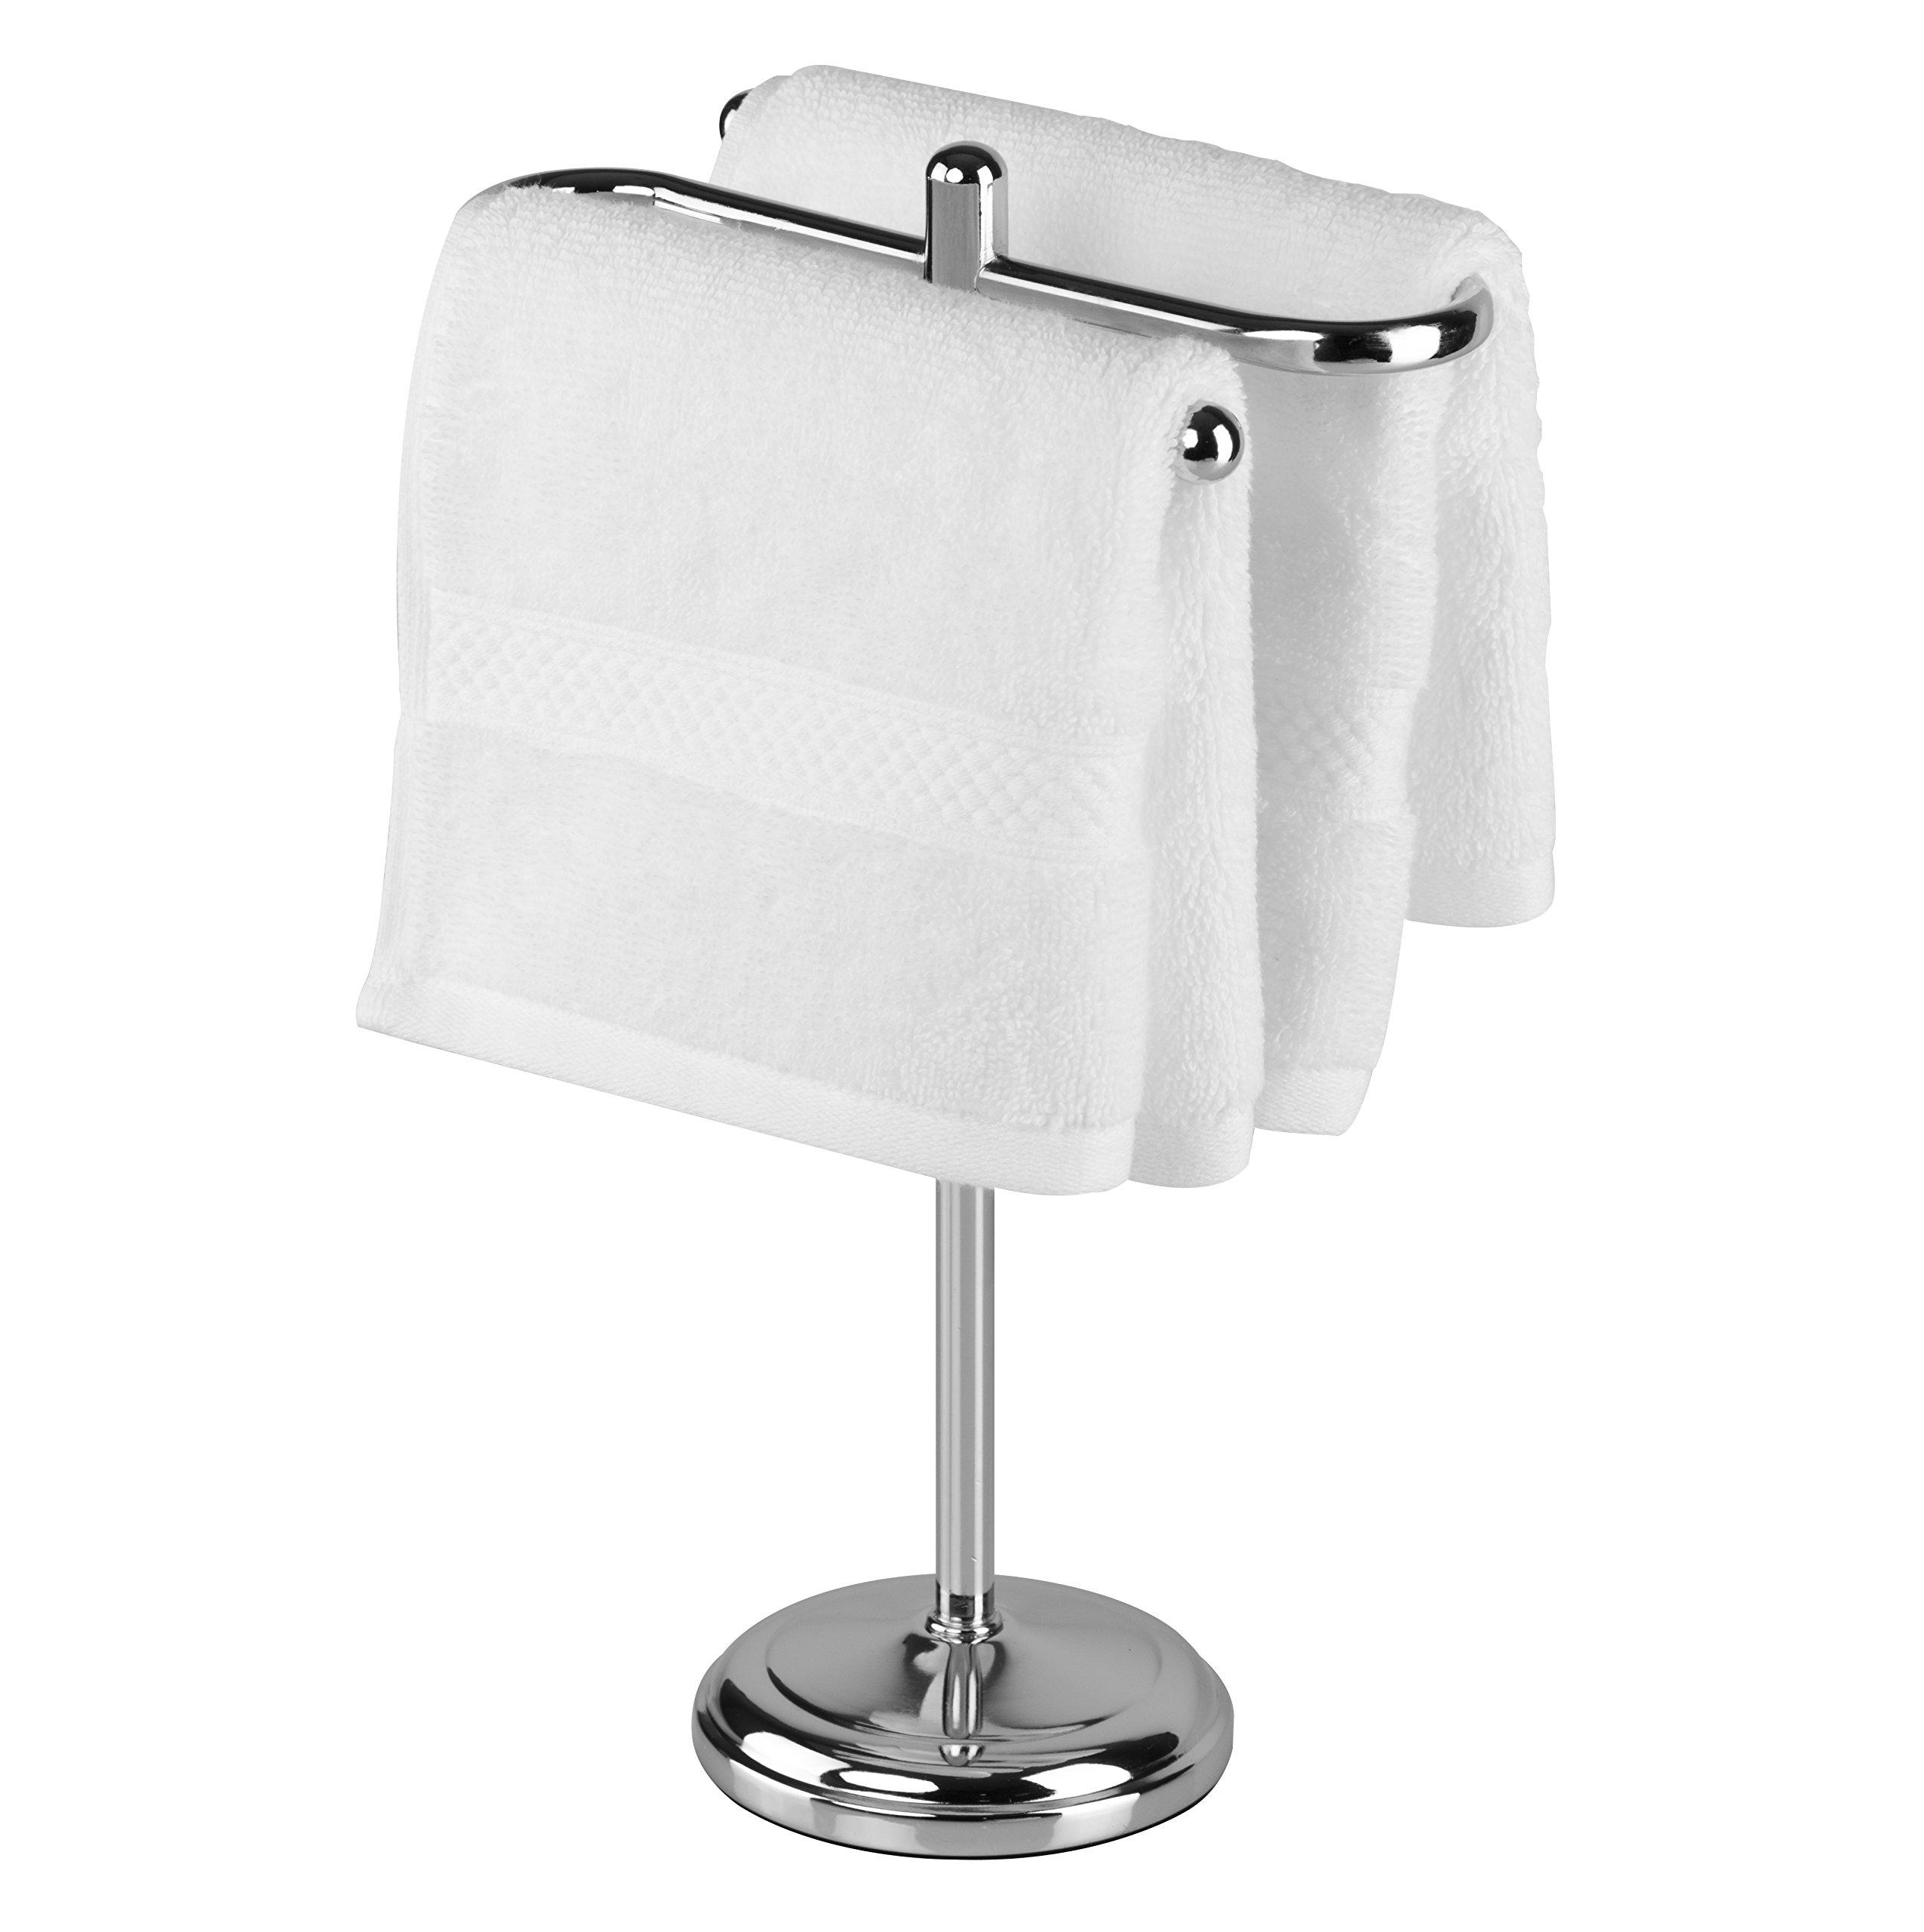 AMG and Enchante Accessories, Free Standing Fingertip Hand Towel Bar Holder Tree Rack, TT100006 CHR, Chrome